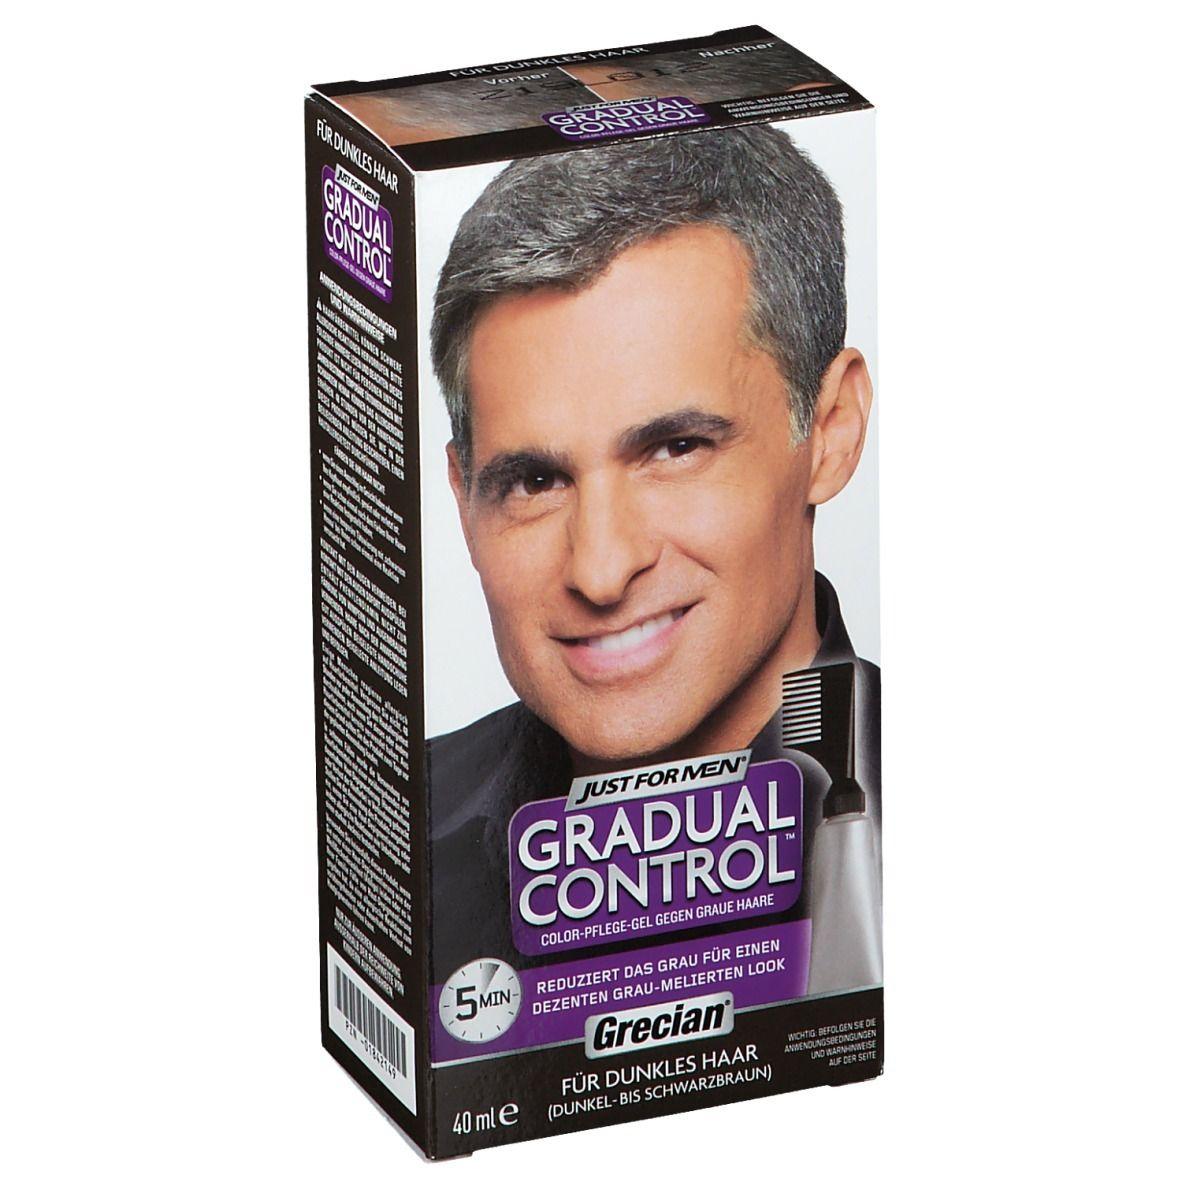 Image of GRECIAN Gradual Control Color-Pflege-Gel dunkles Haar